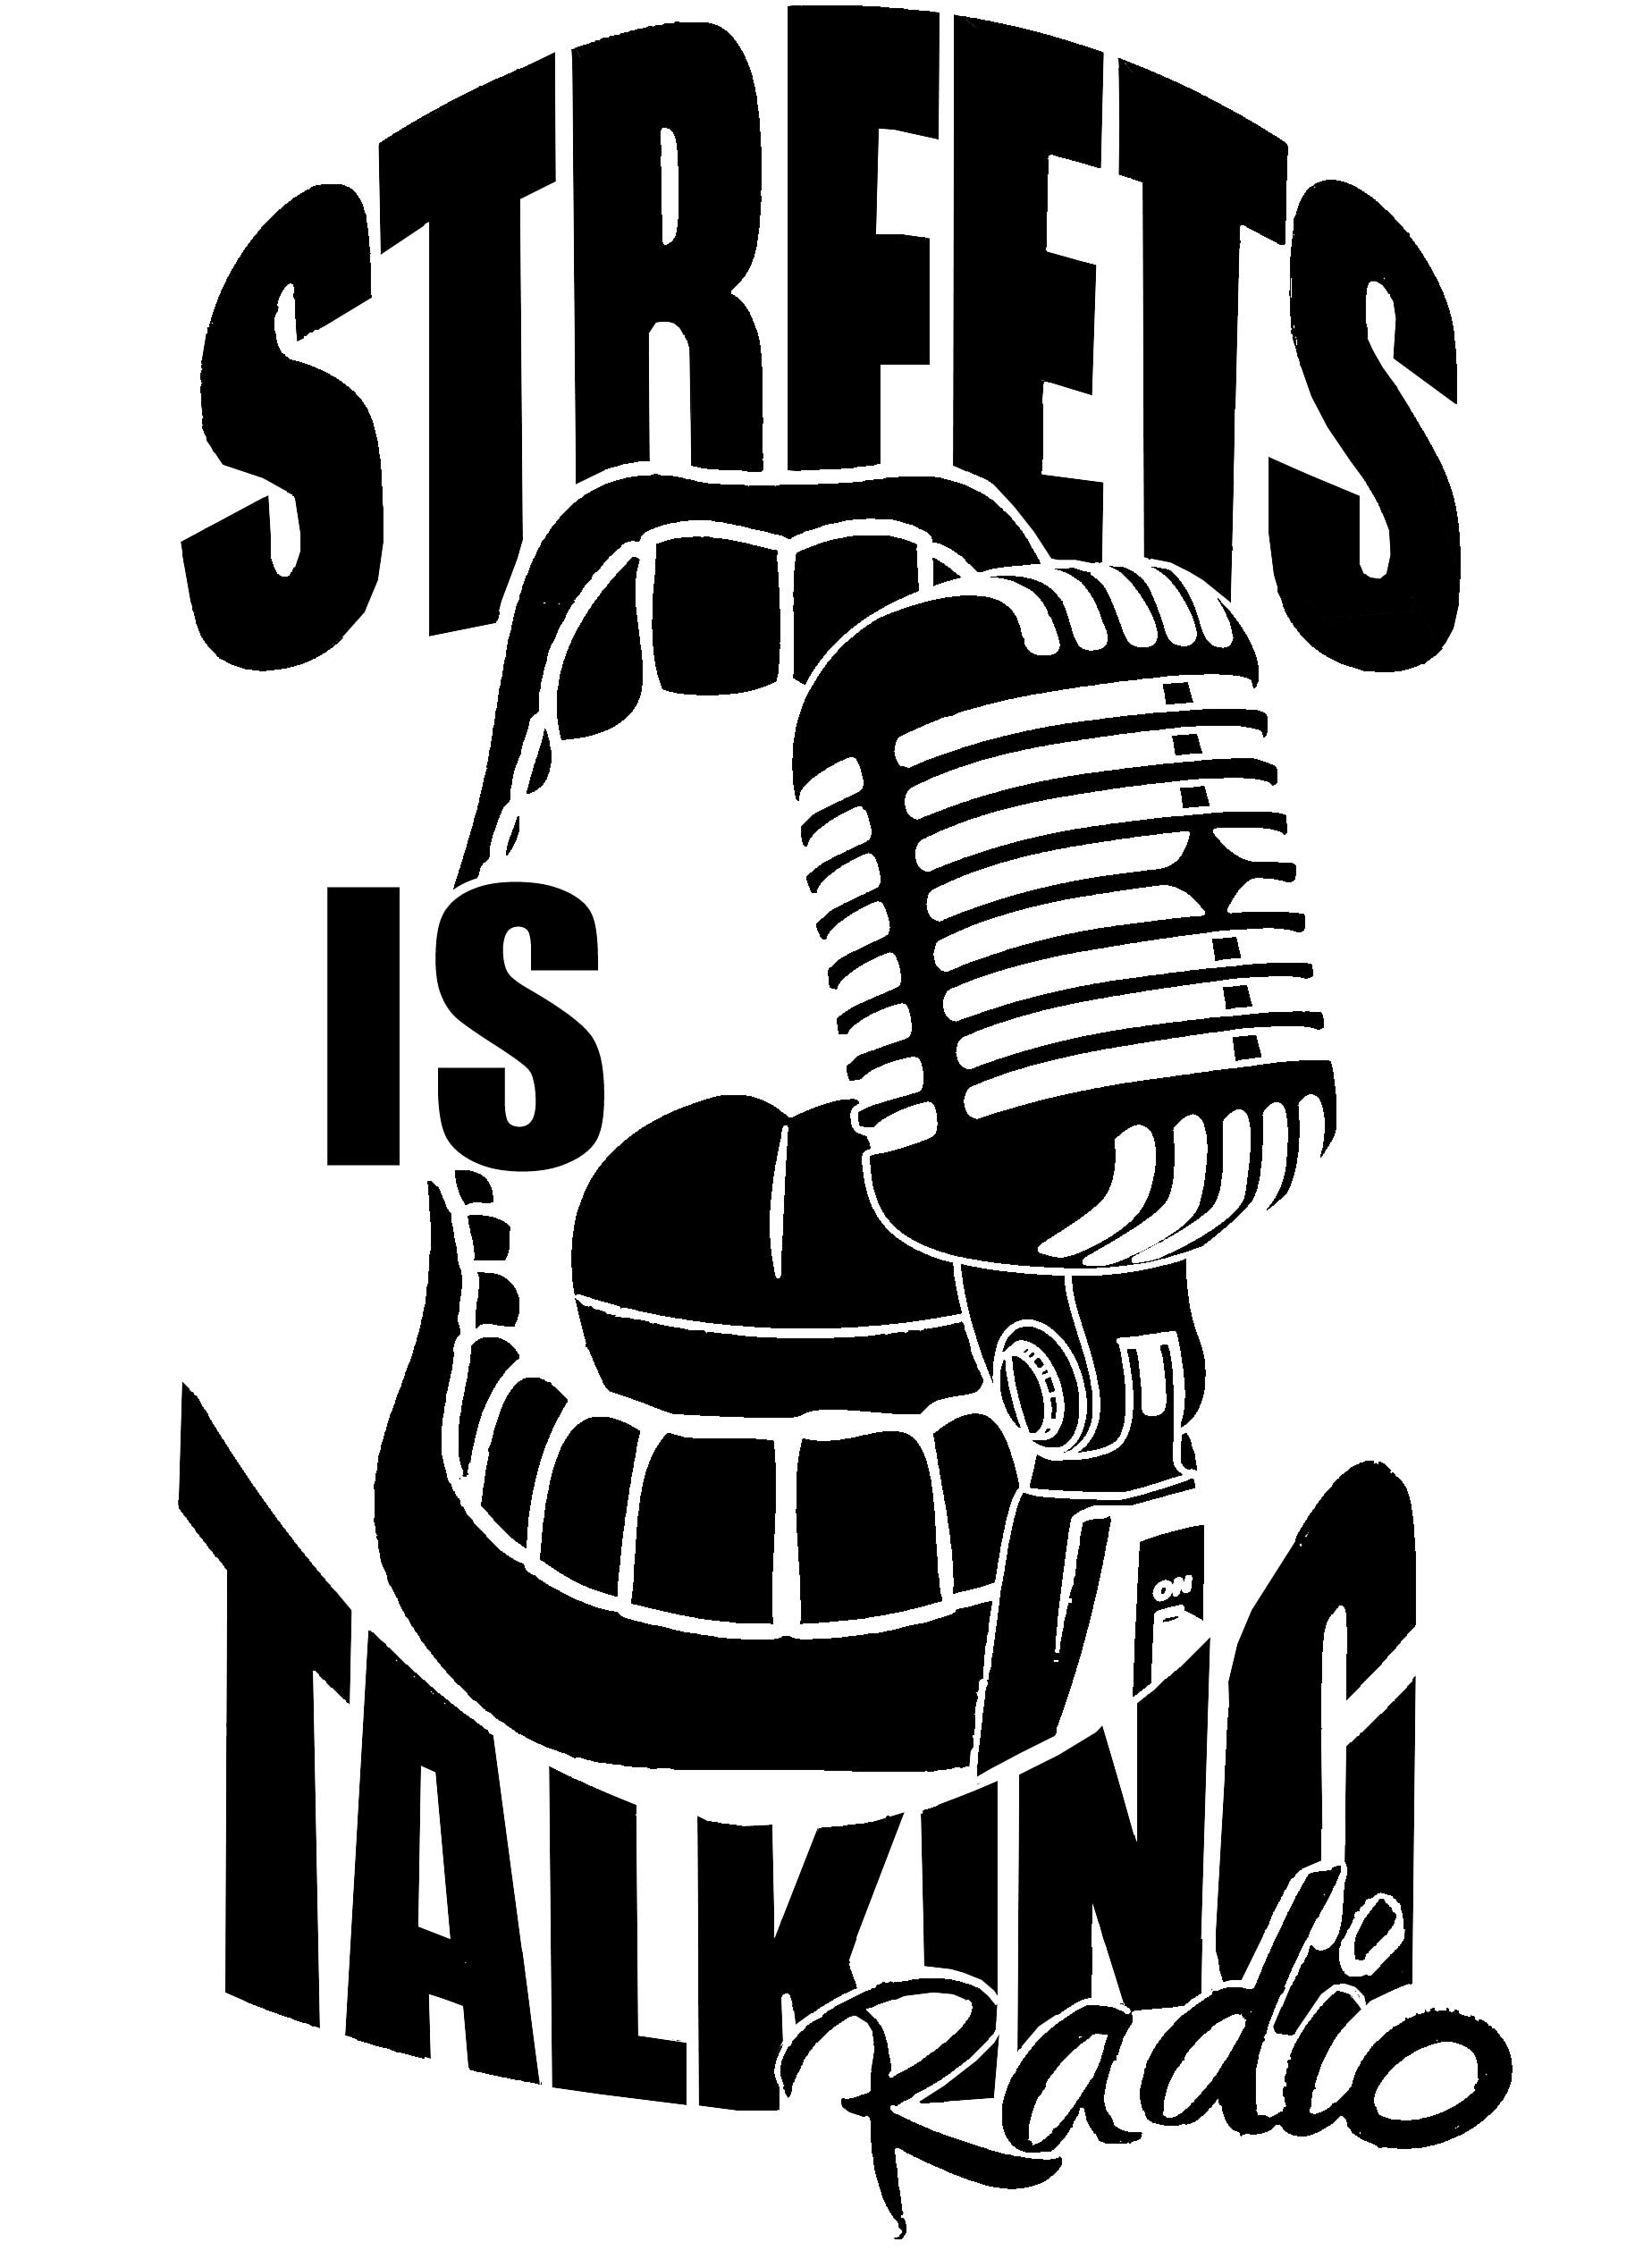 Streets Radio